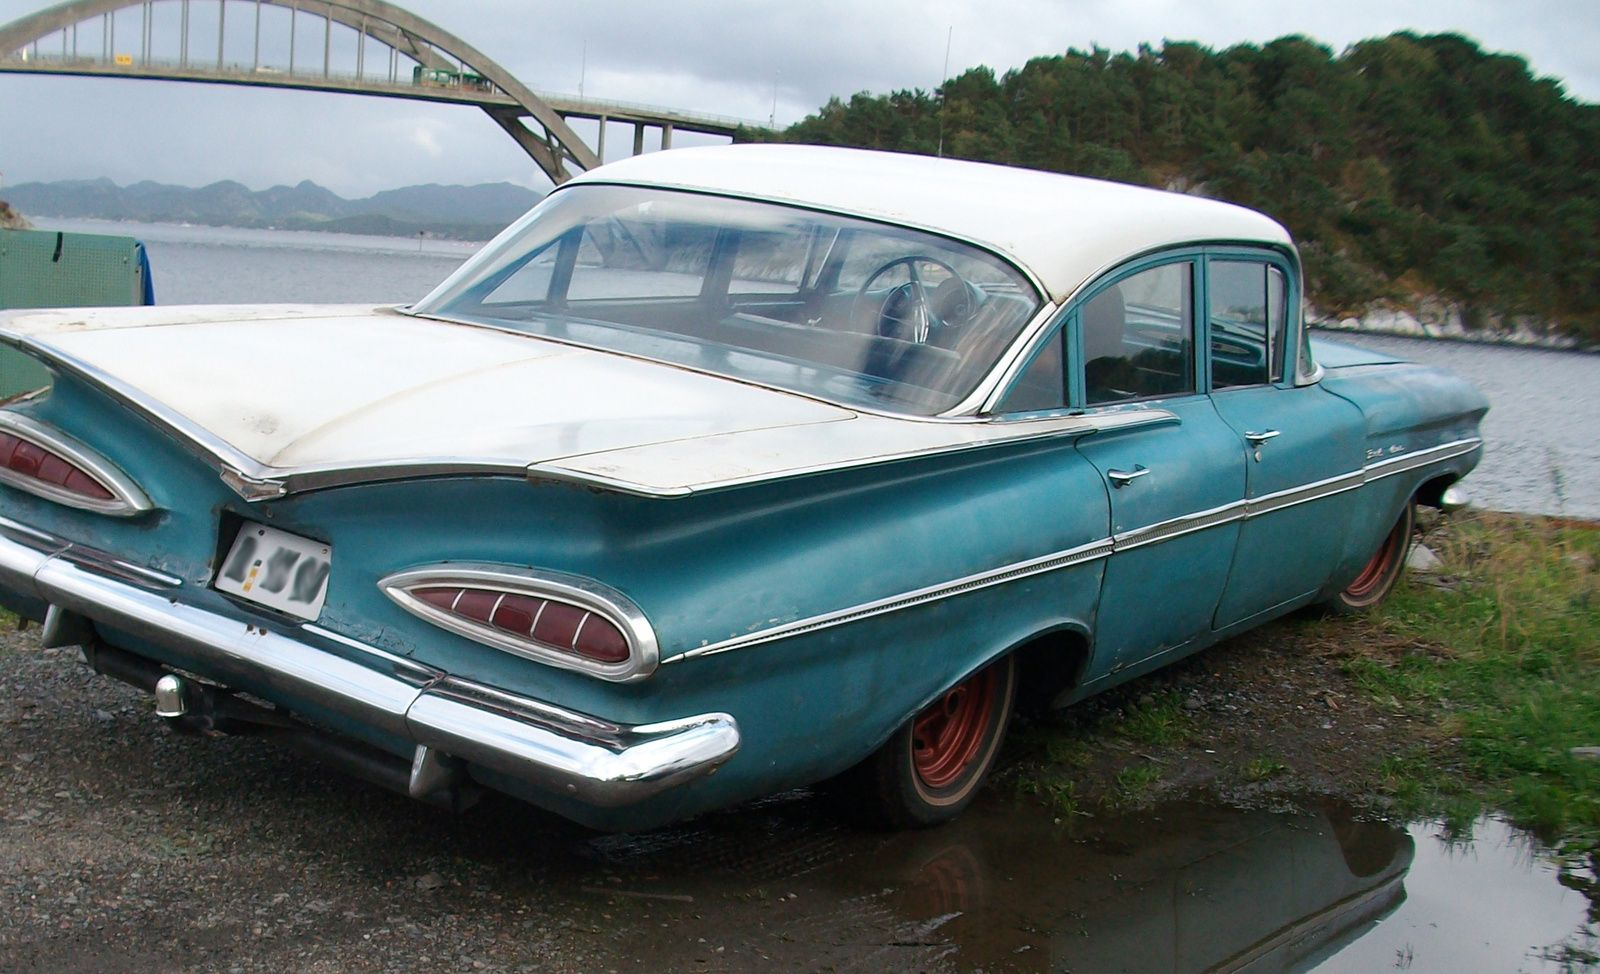 hight resolution of 1962 impala chevrolet classic cars pinterest 1962 chevrolet impala 1959 chevrolet bel air wiring diagram